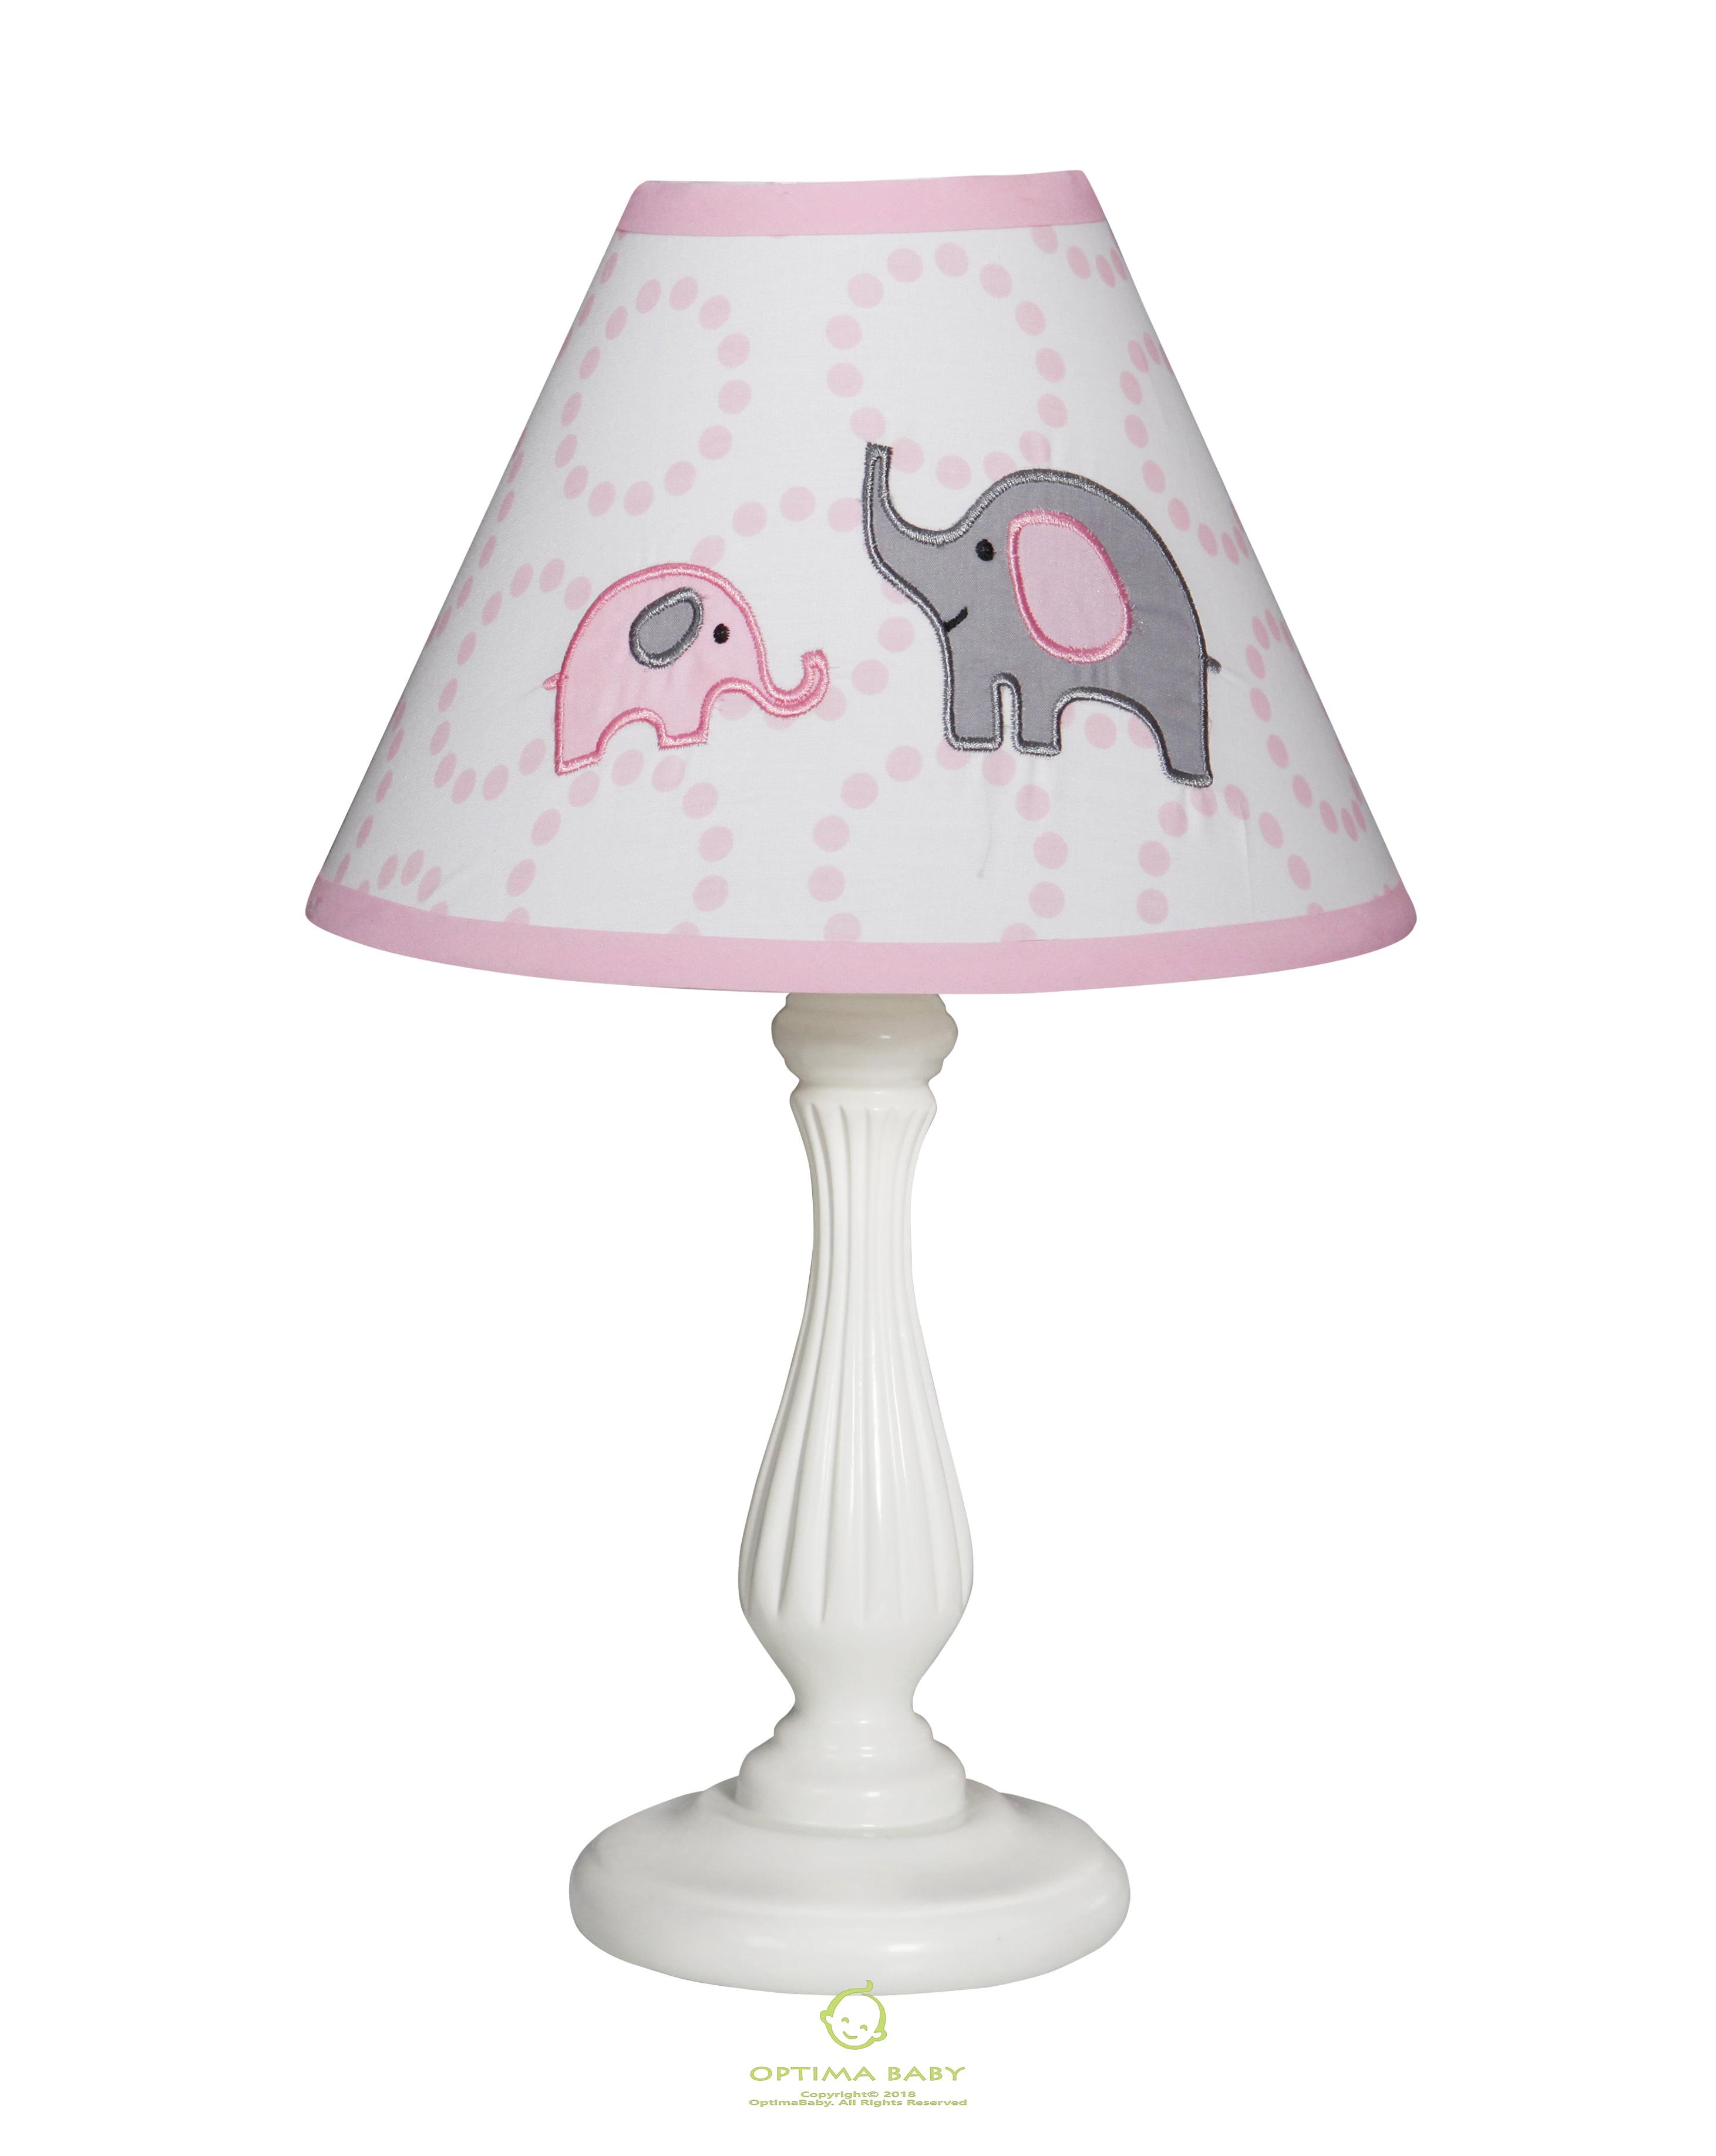 OptimaBaby Pink Grey Elephant Lamp Shade Without Base ...